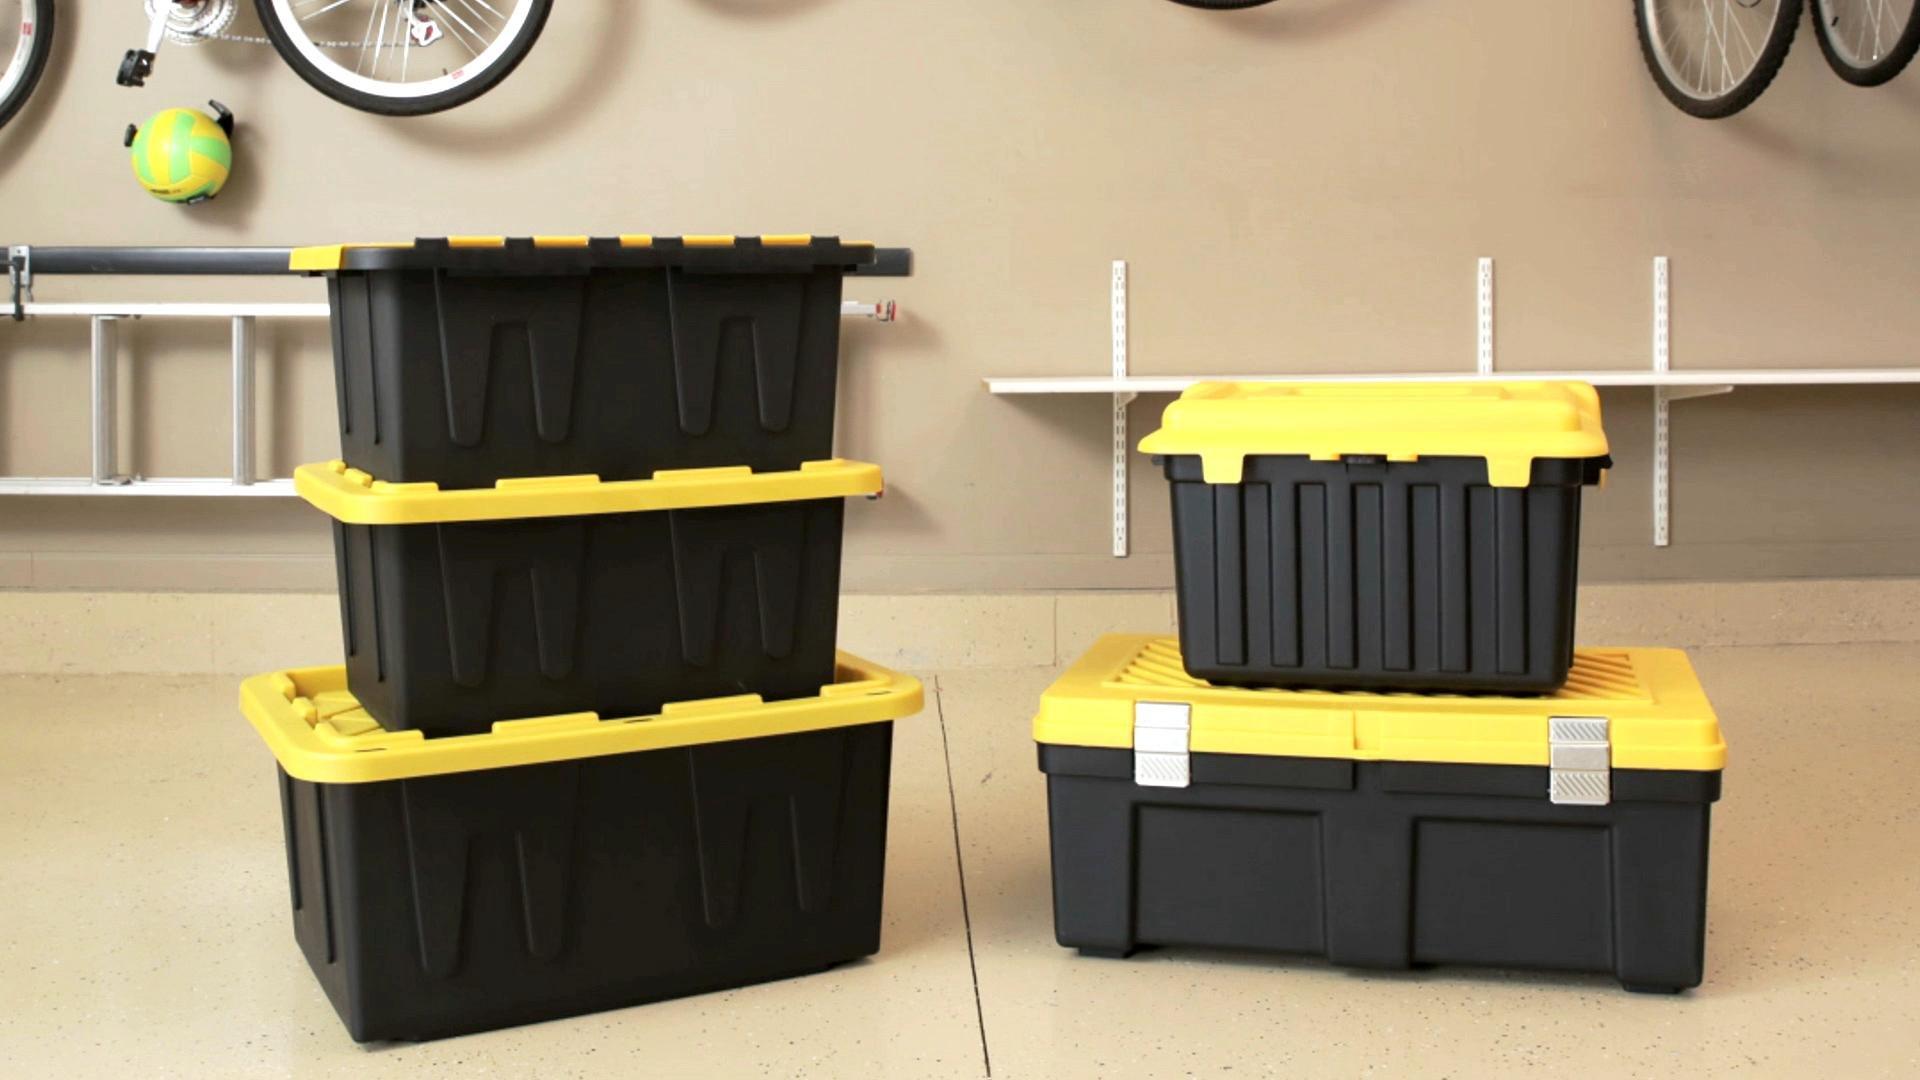 Homz Durabilt Heavy Duty Totes, 18 Gallon, Black, Set of 8 by HOMZ (Image #2)